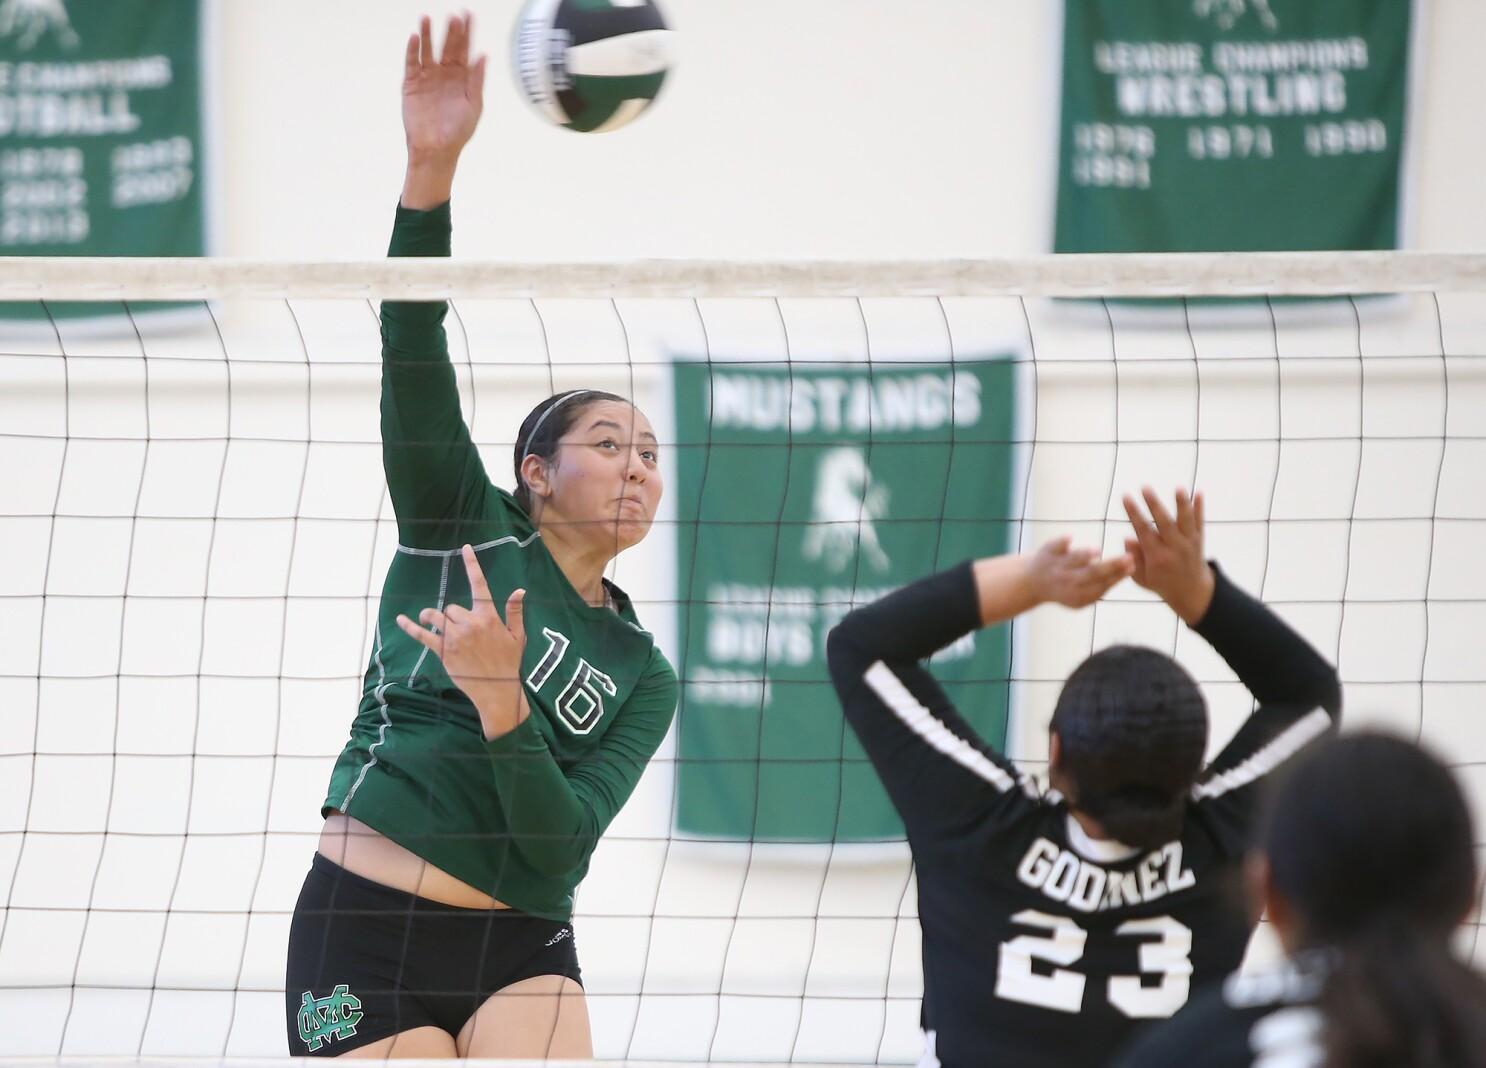 Costa Mesa girls' volleyball sweeps Godinez in home opener